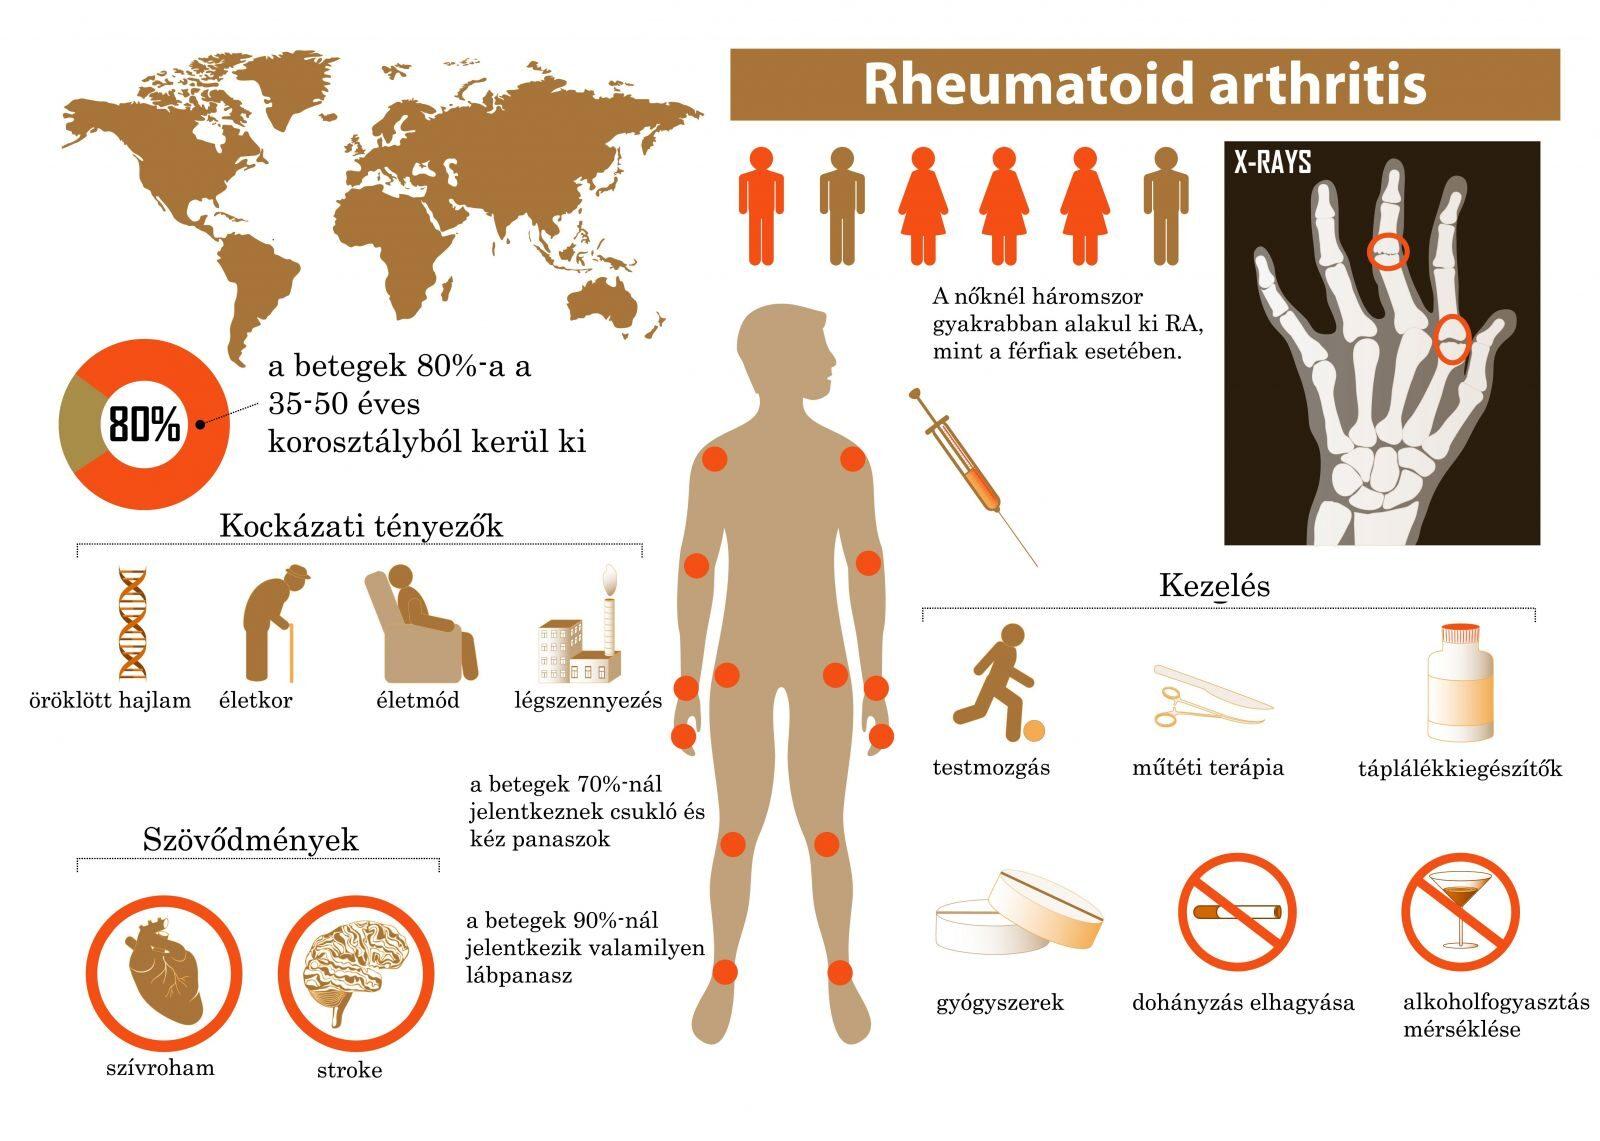 koszveny jelei artrózis kezelése chisinau ban